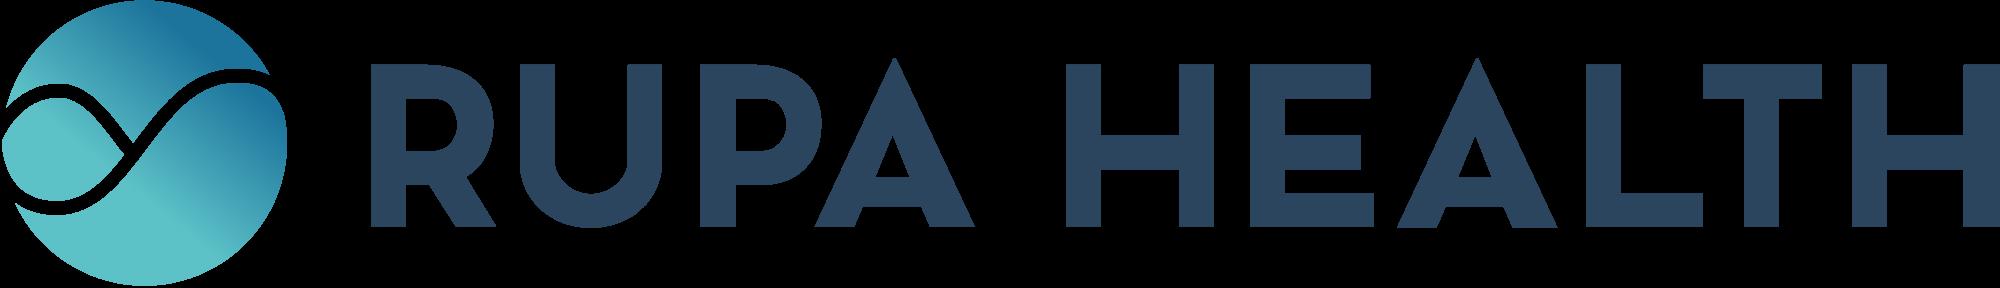 Rupa Health logo